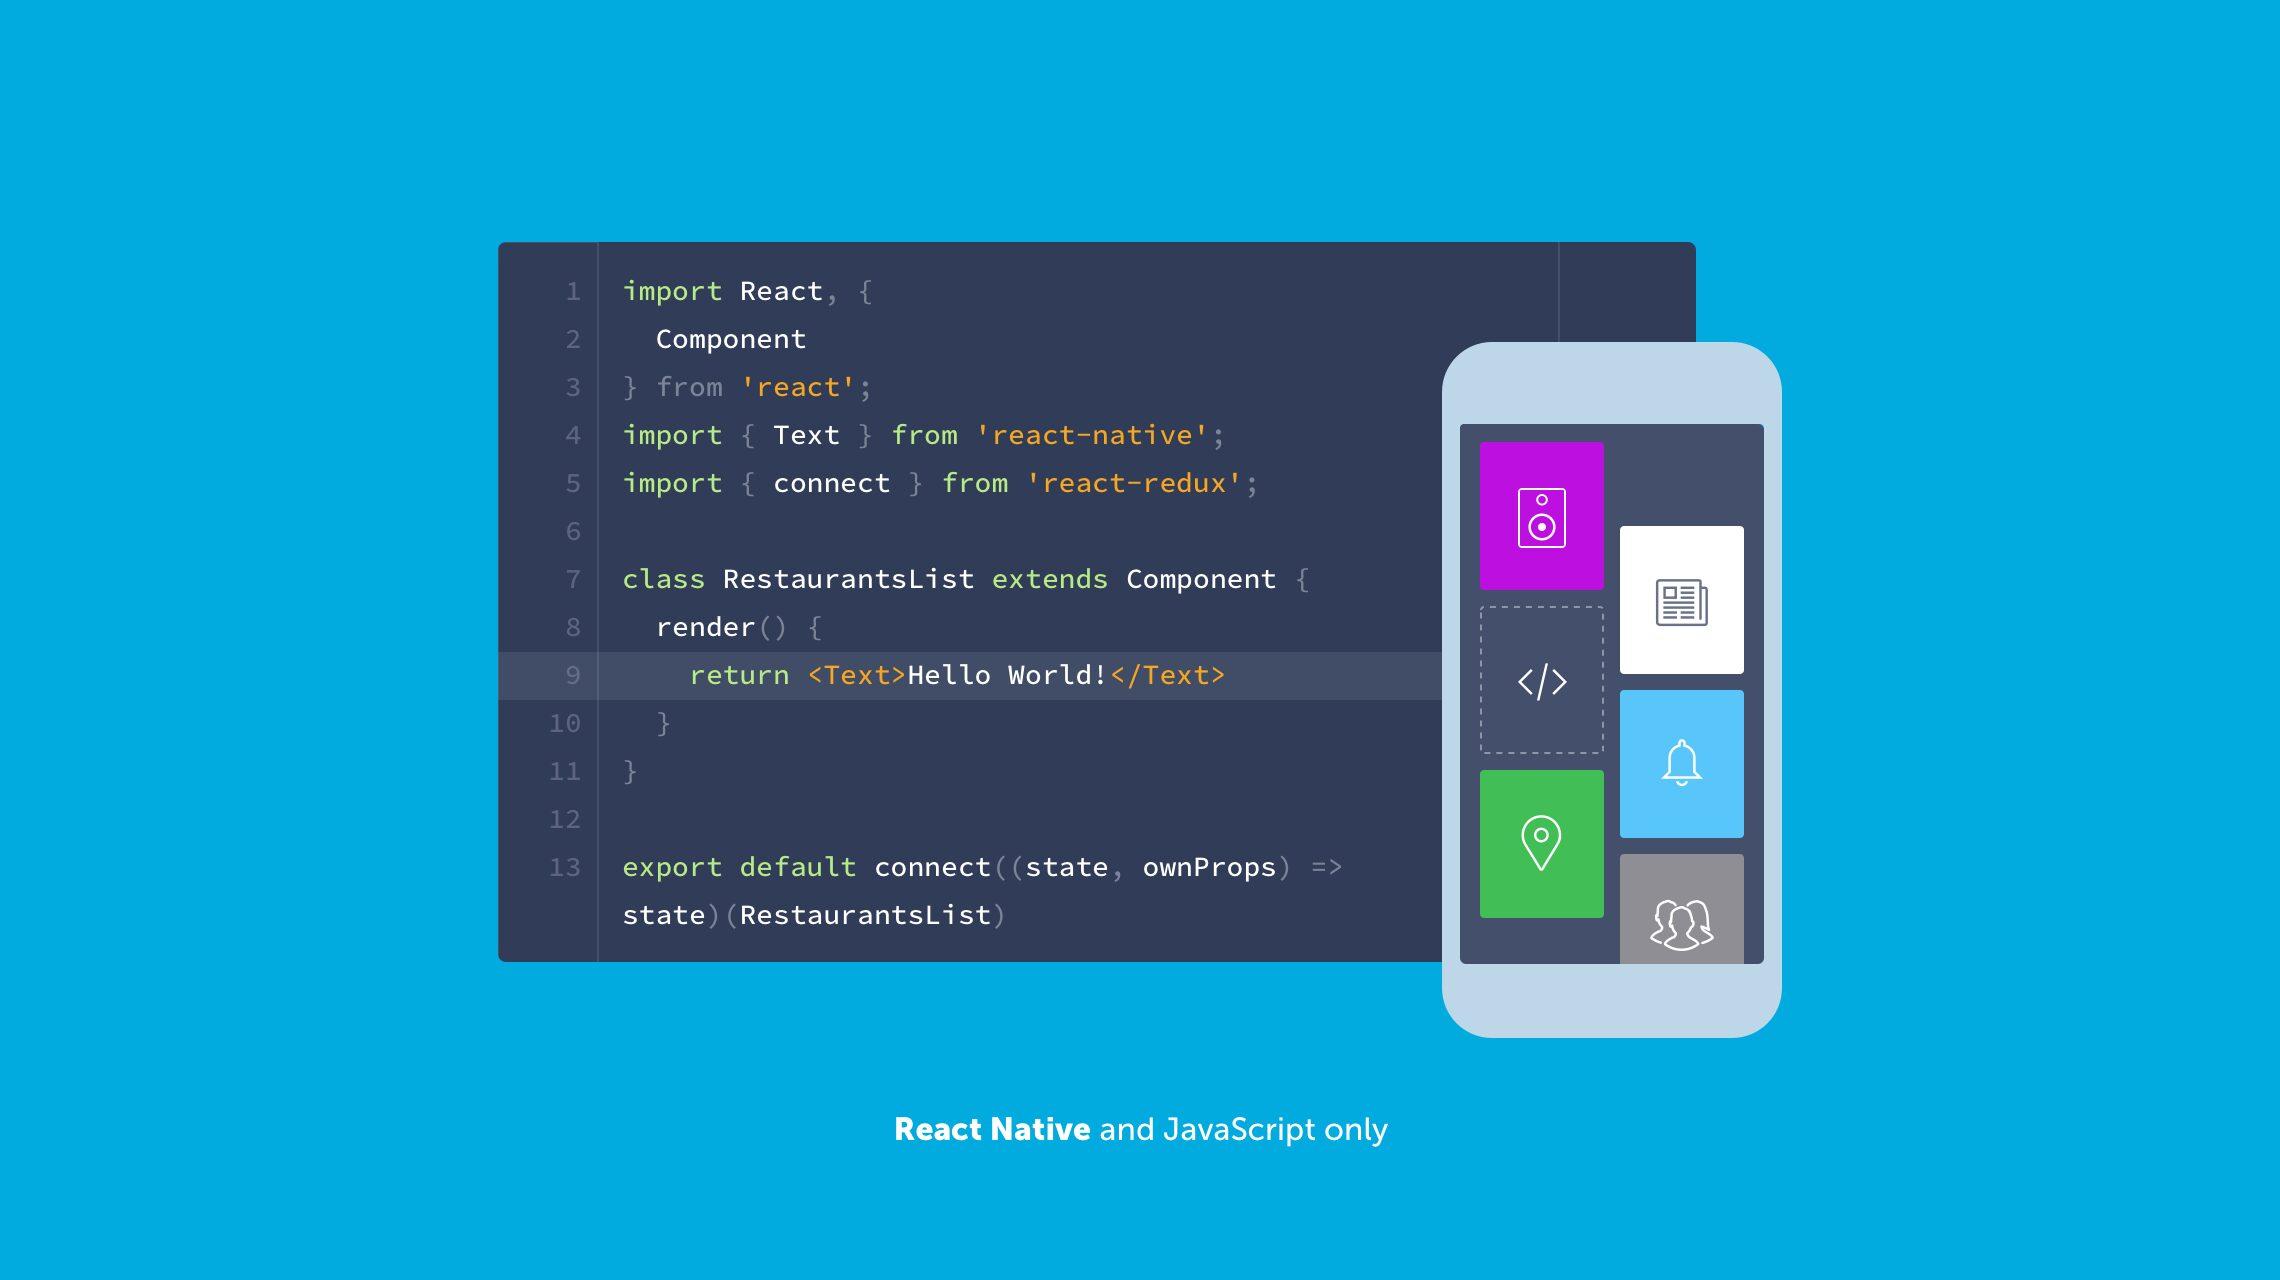 React Native and Javascript